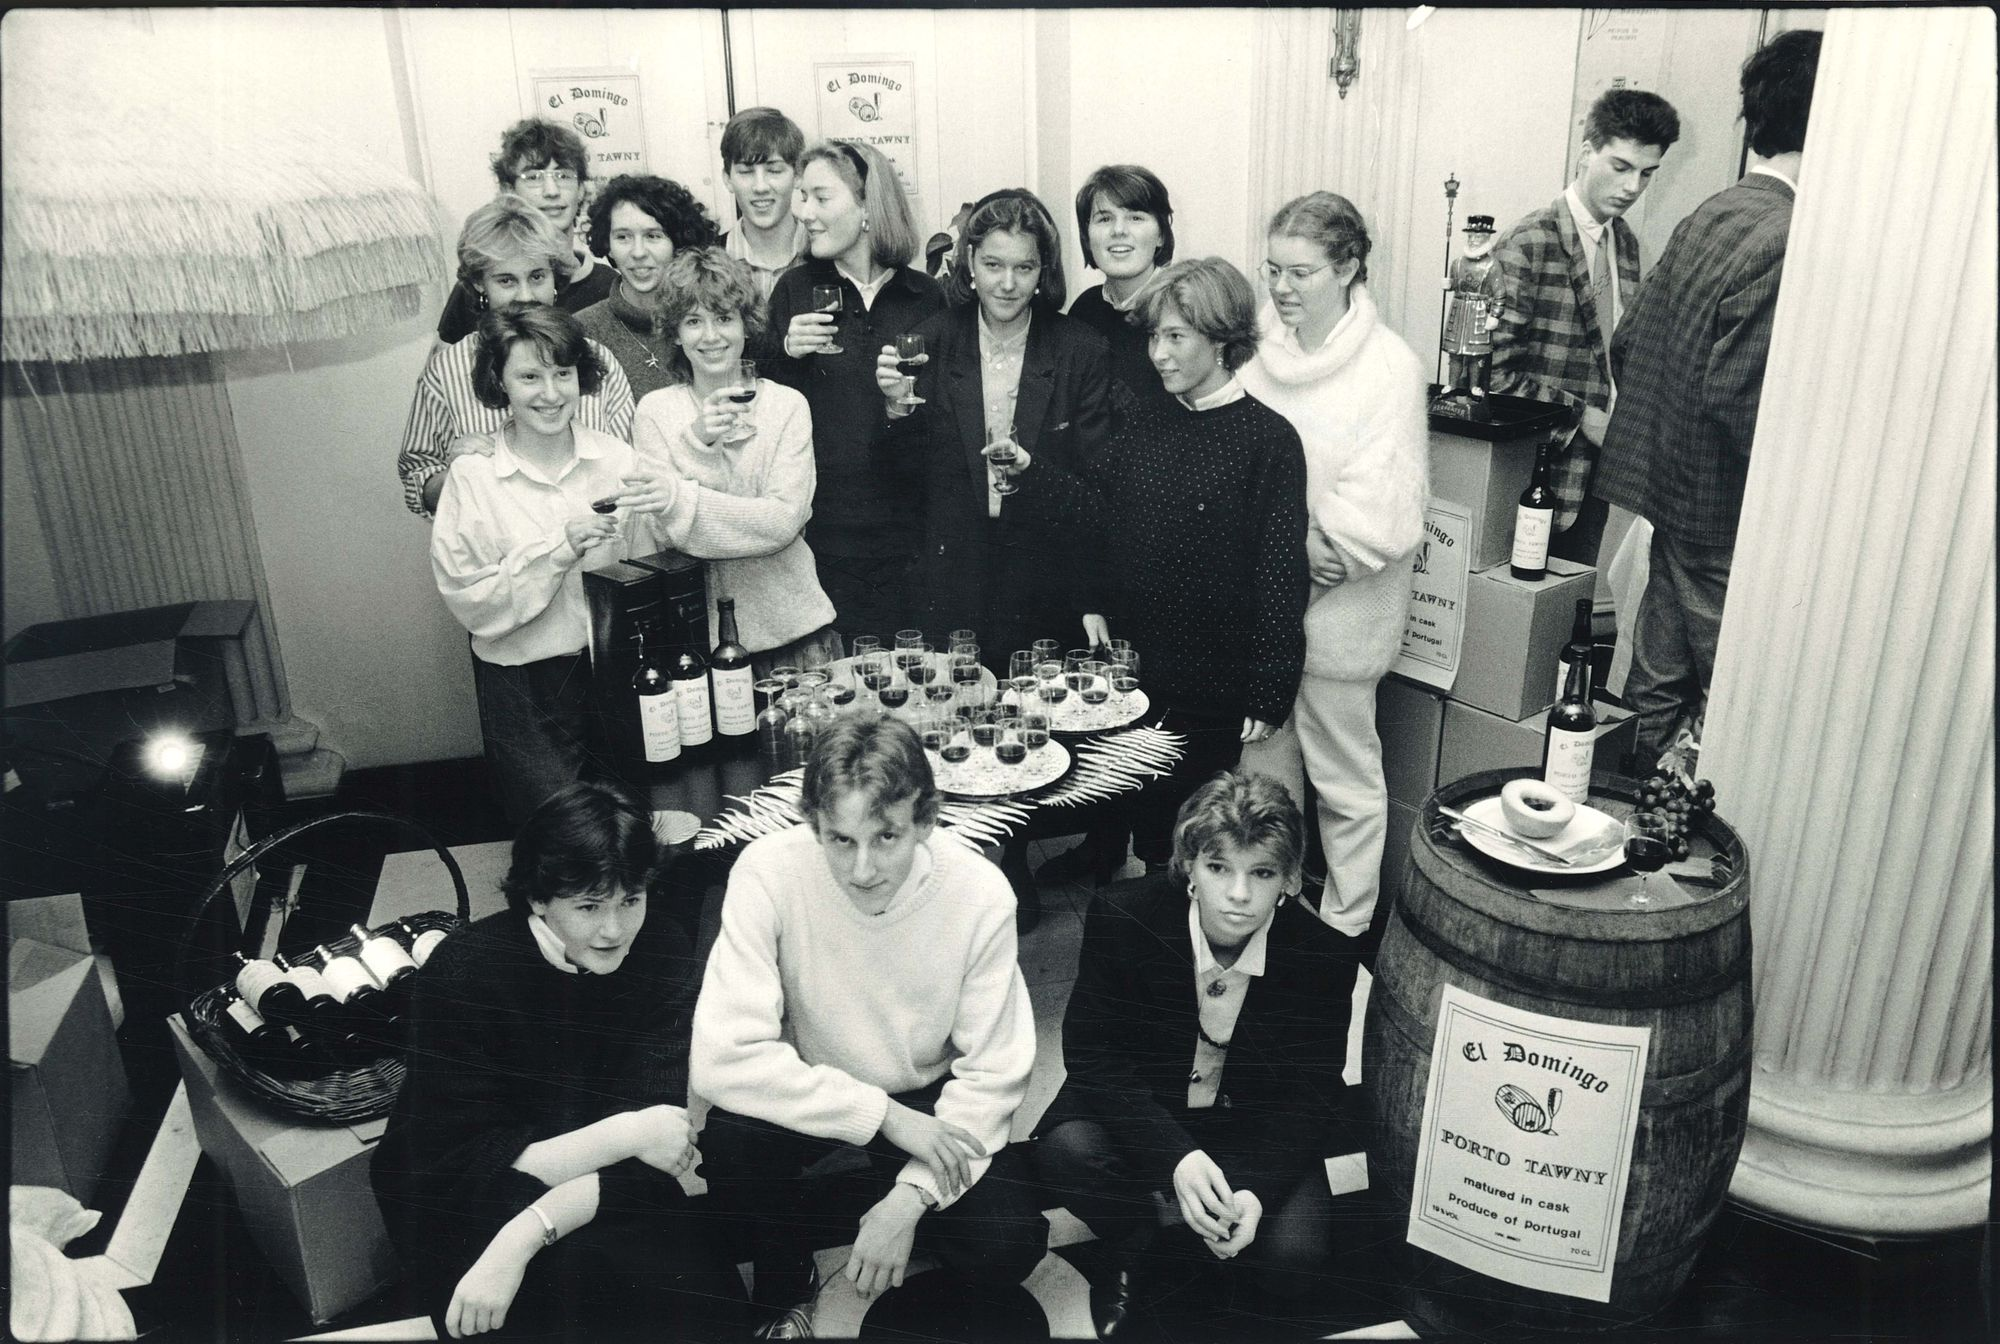 Mini-Onderneming PORTO EL DOMINGO 1986